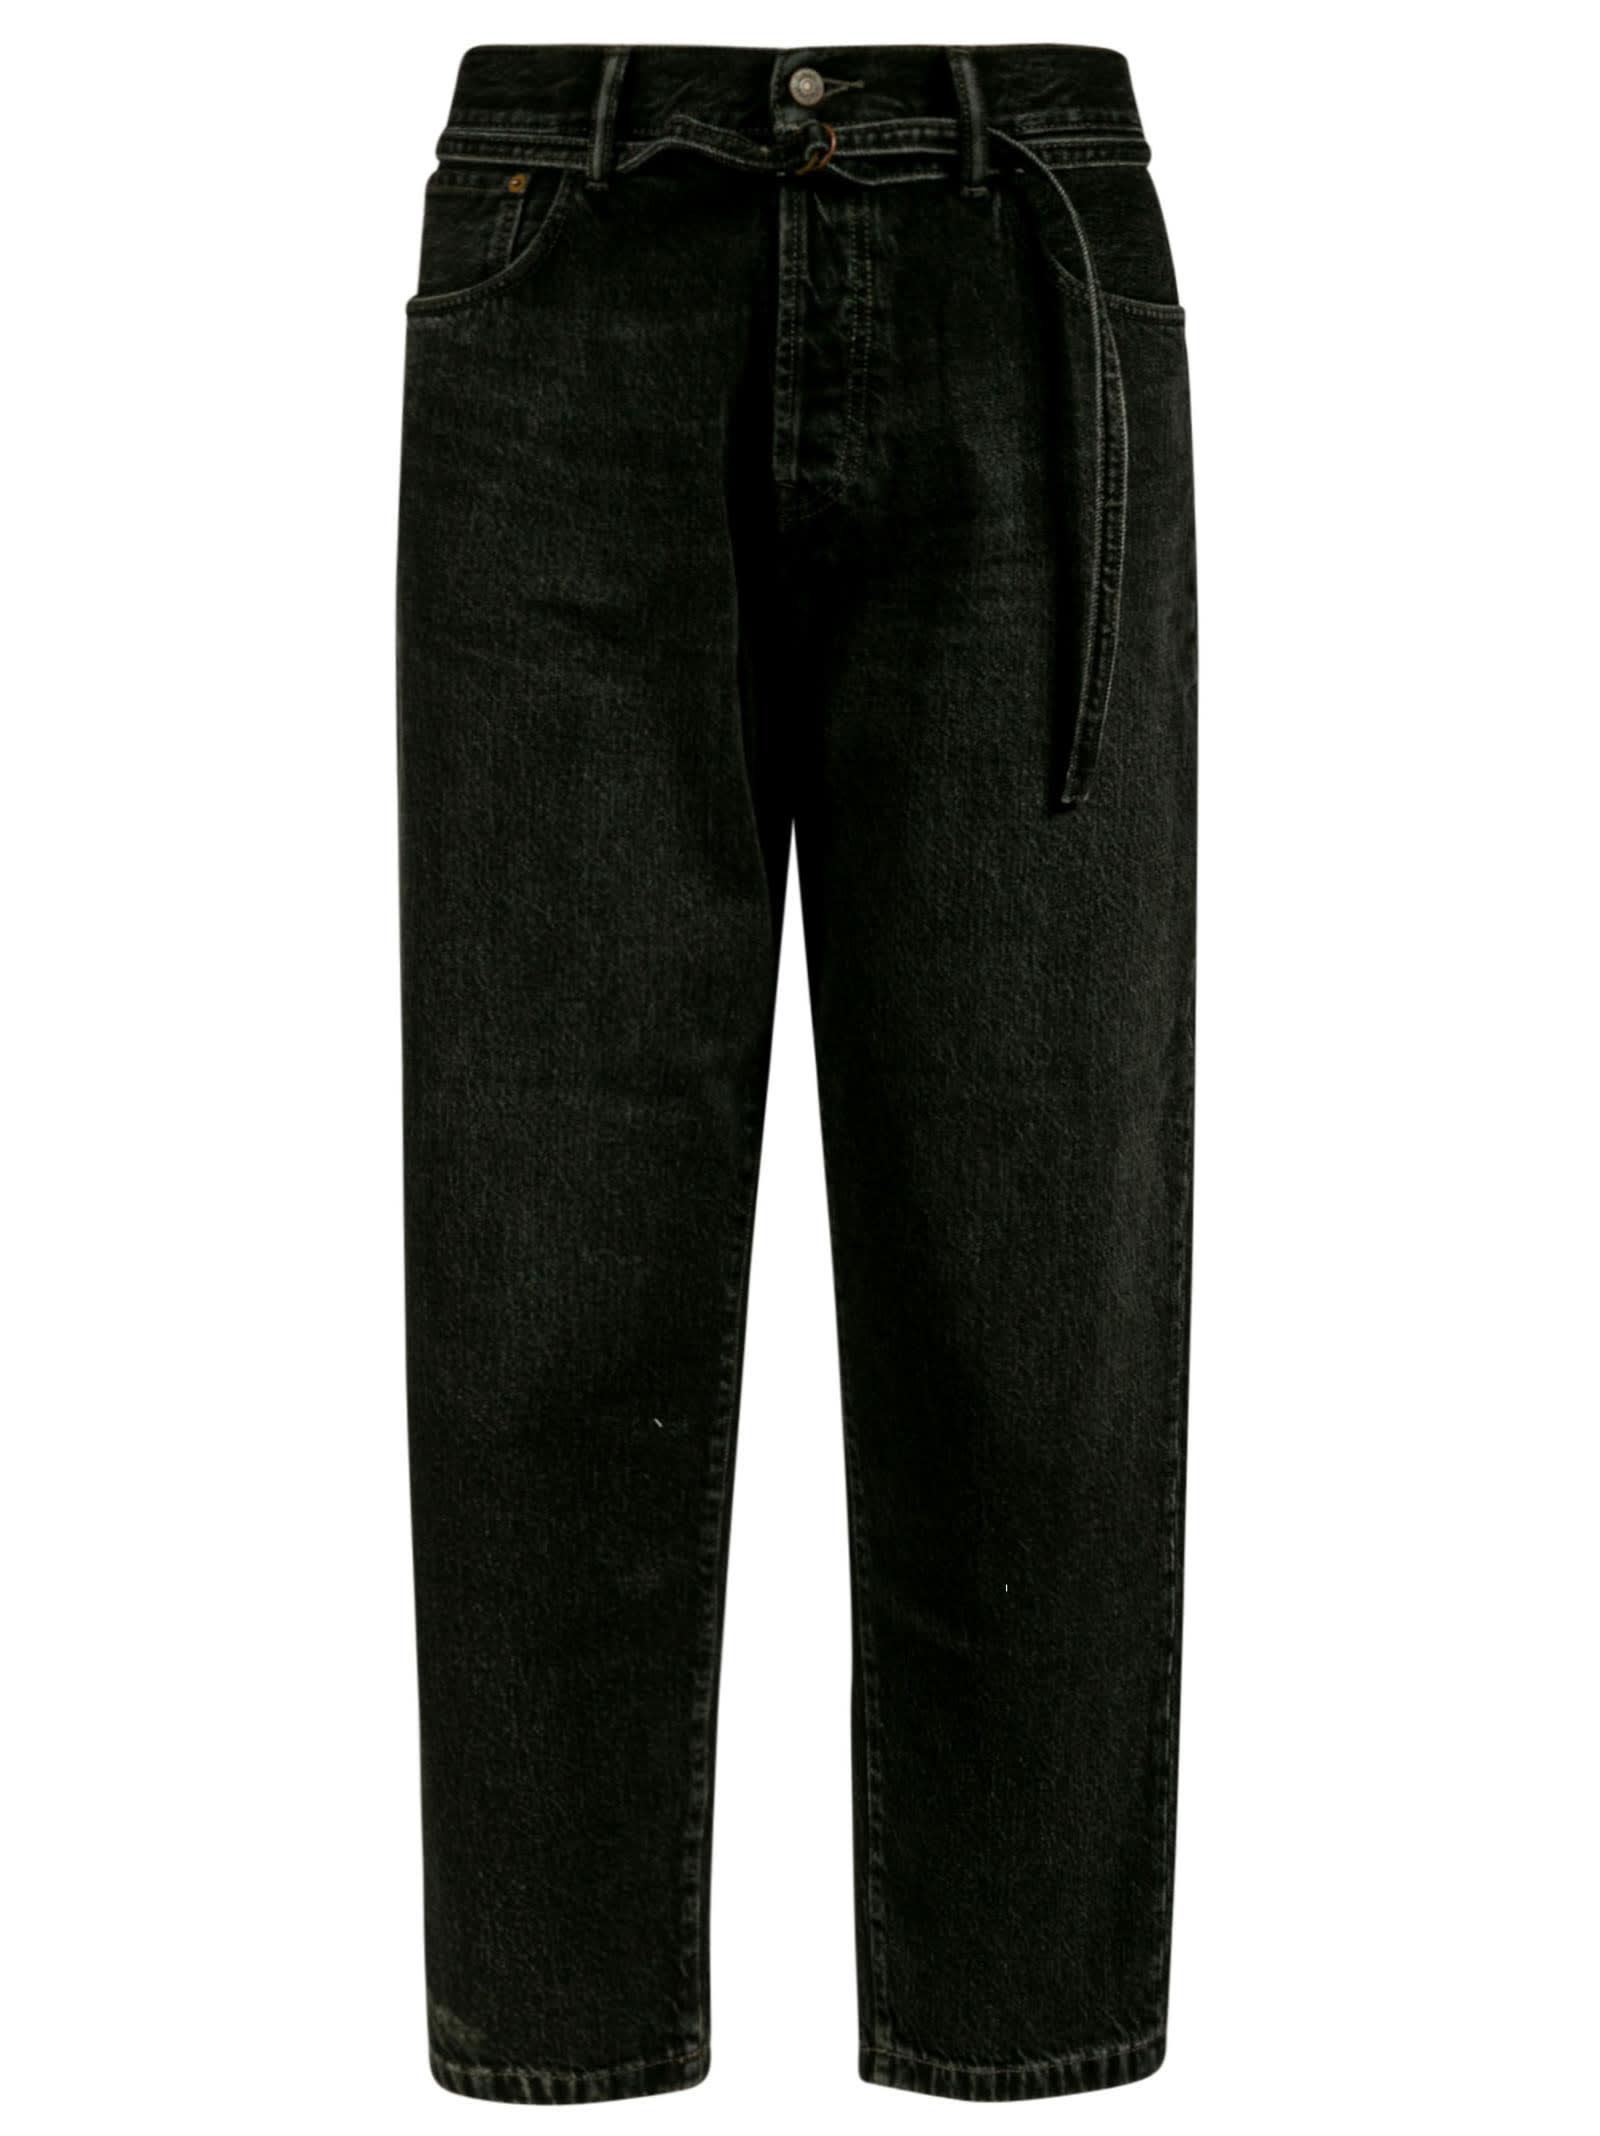 Acne Studios Straight Length Jeans